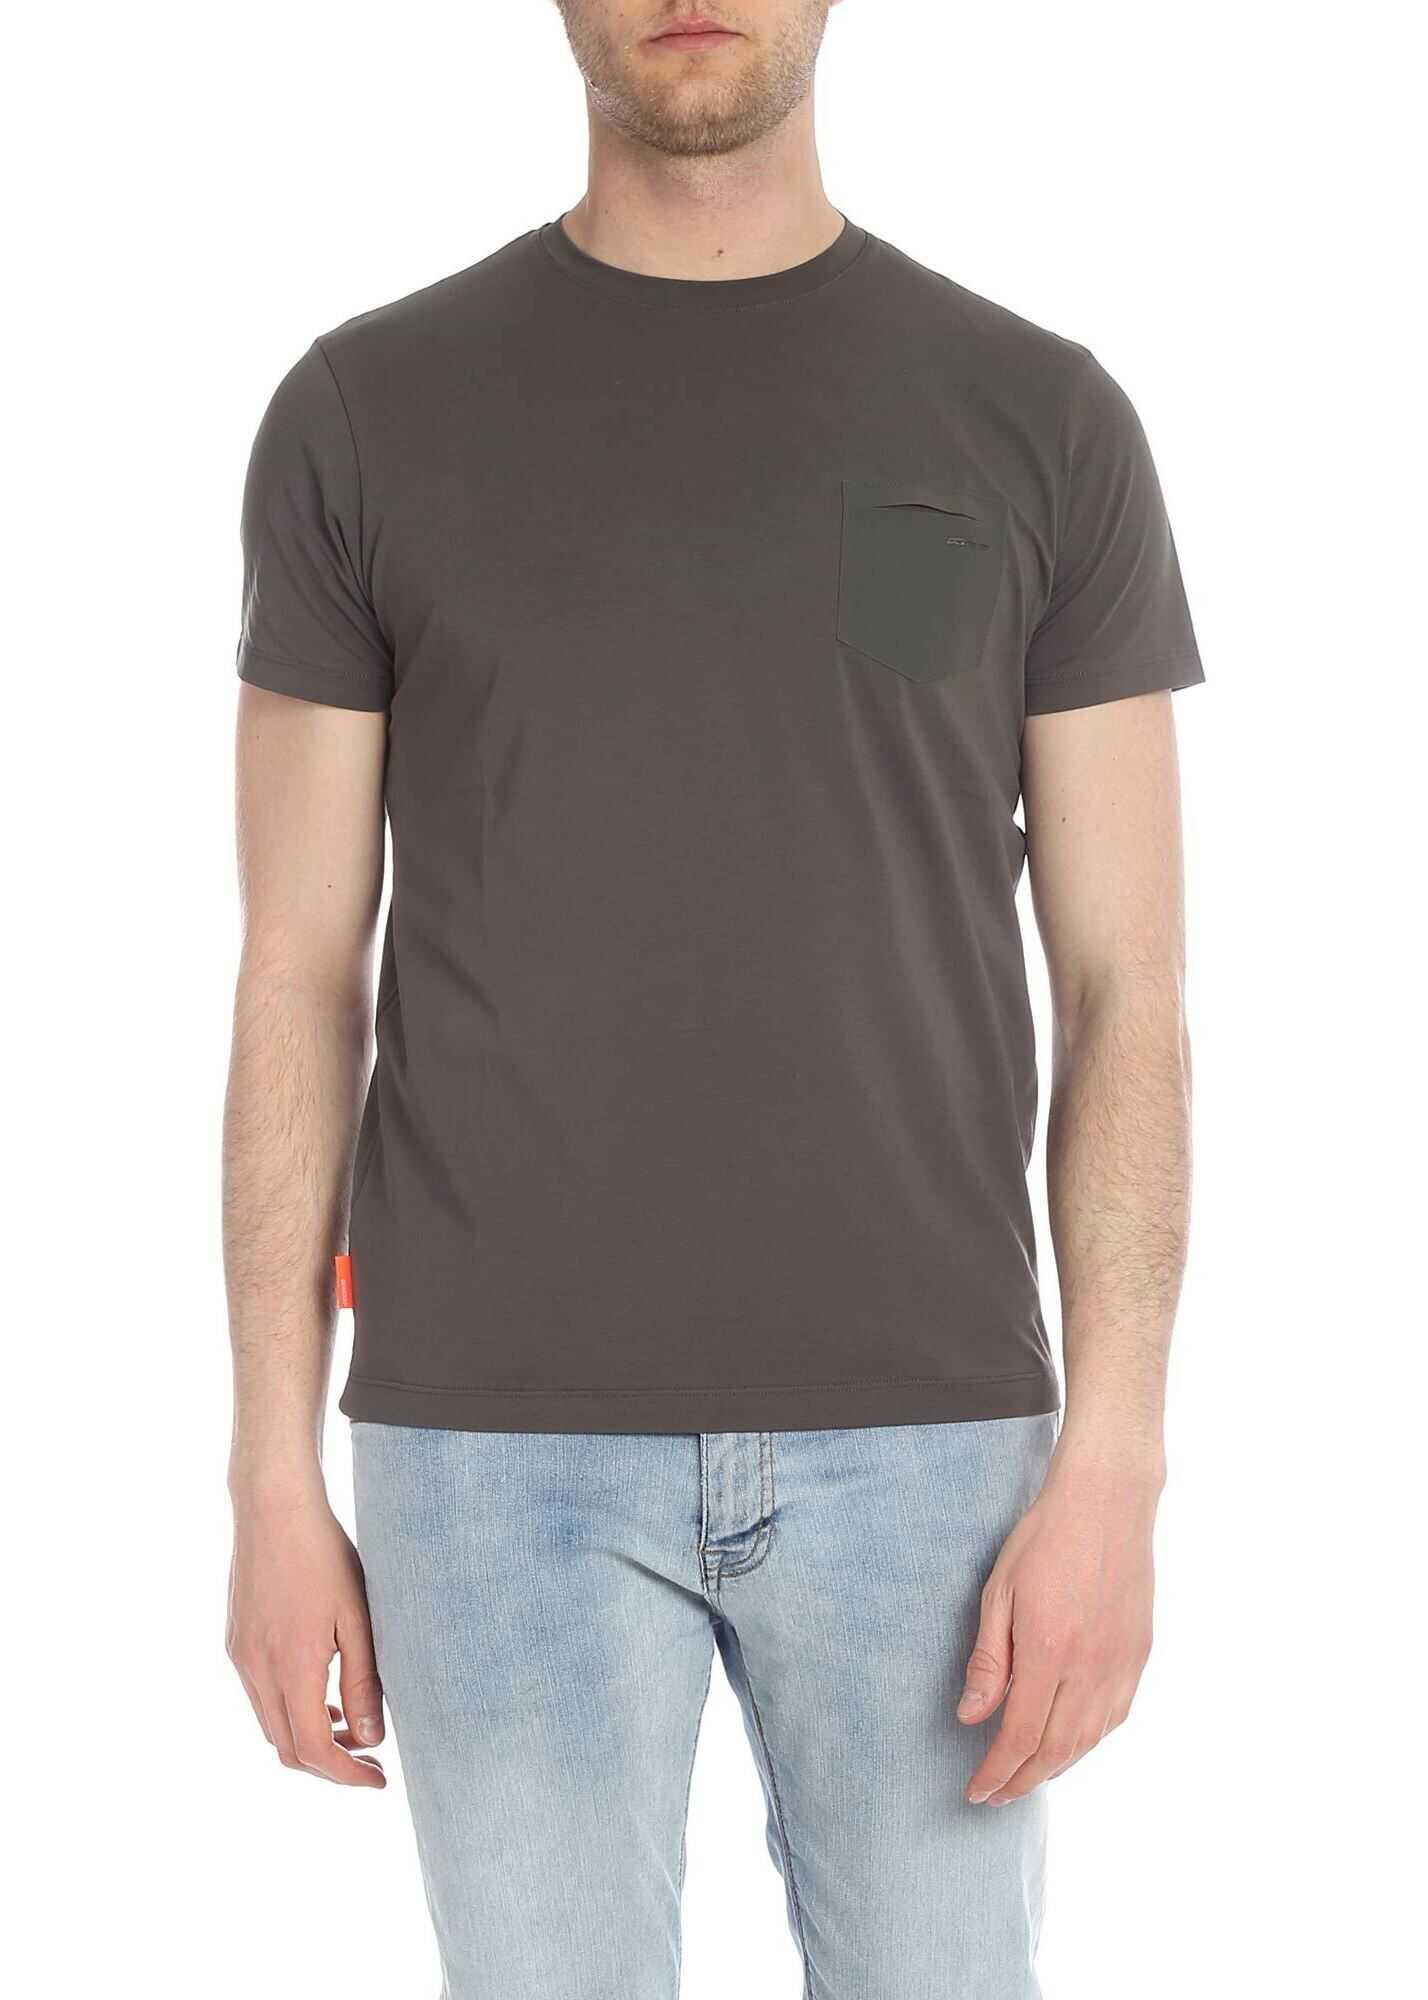 RRD Roberto Ricci Designs Green Revo T-Shirt With Pocket Green